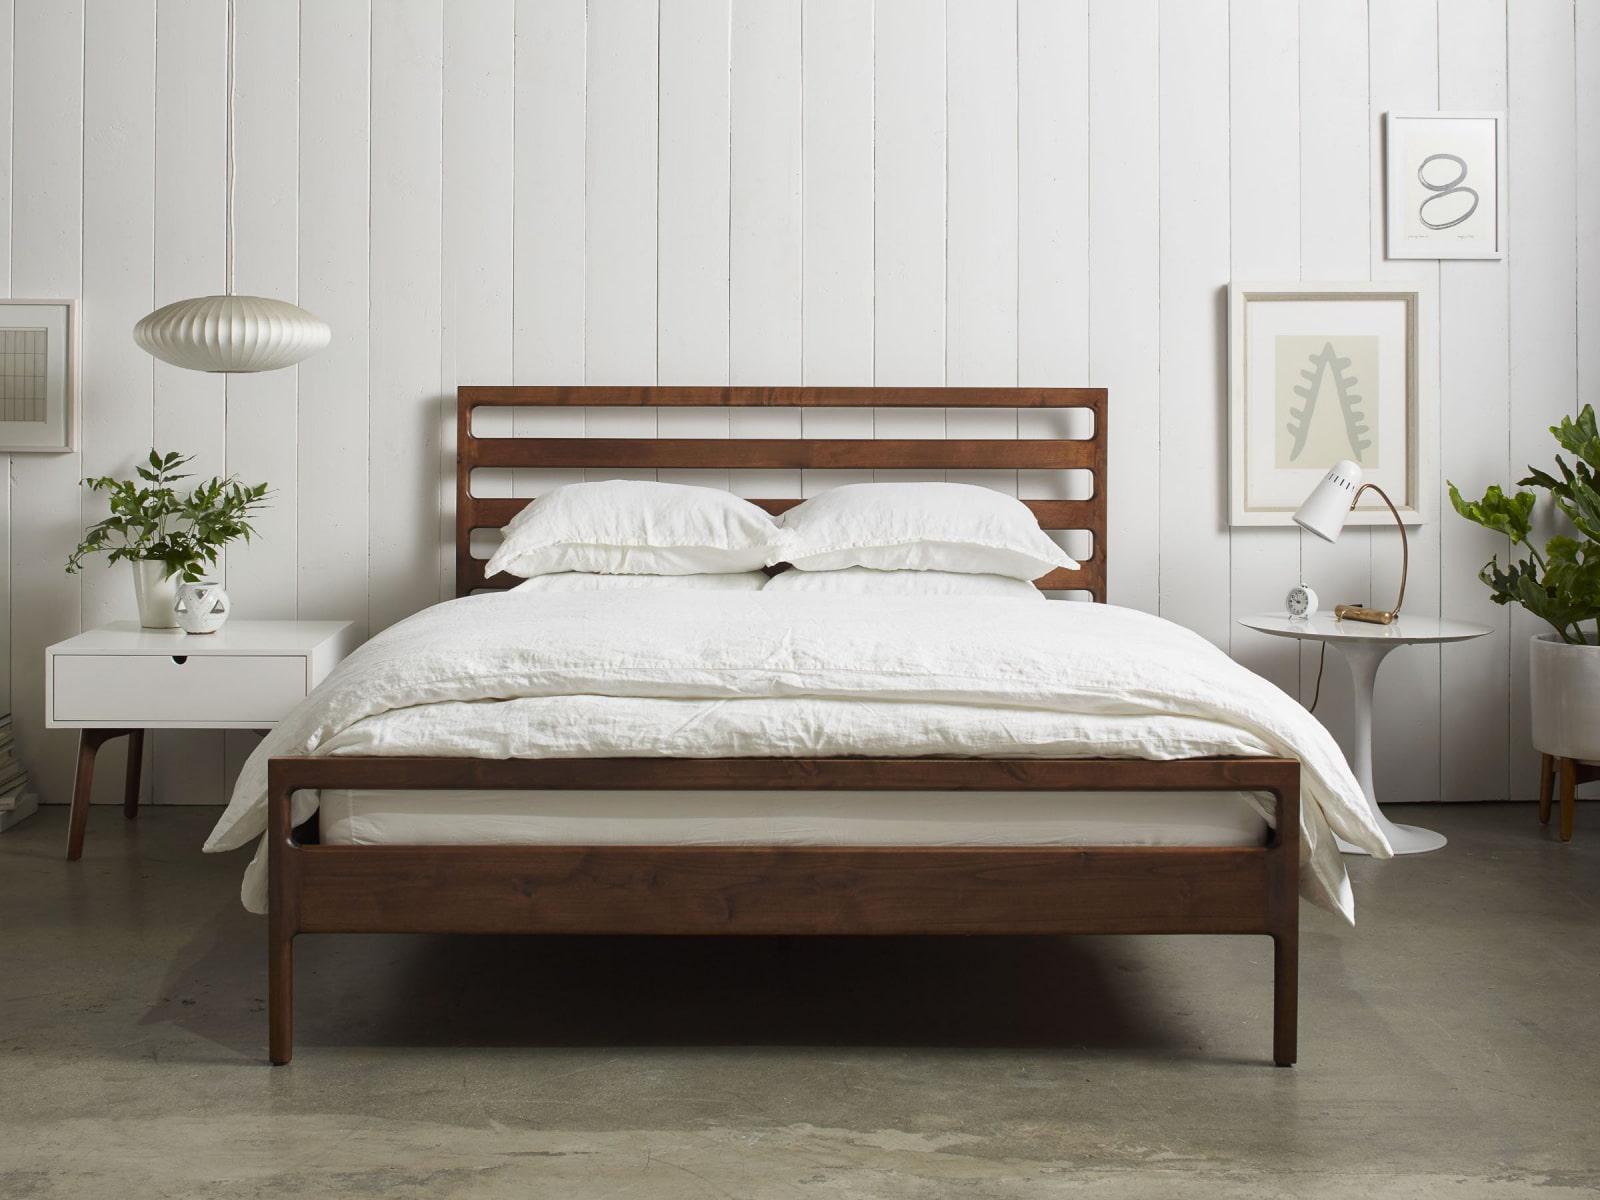 проблема скрипа кровати